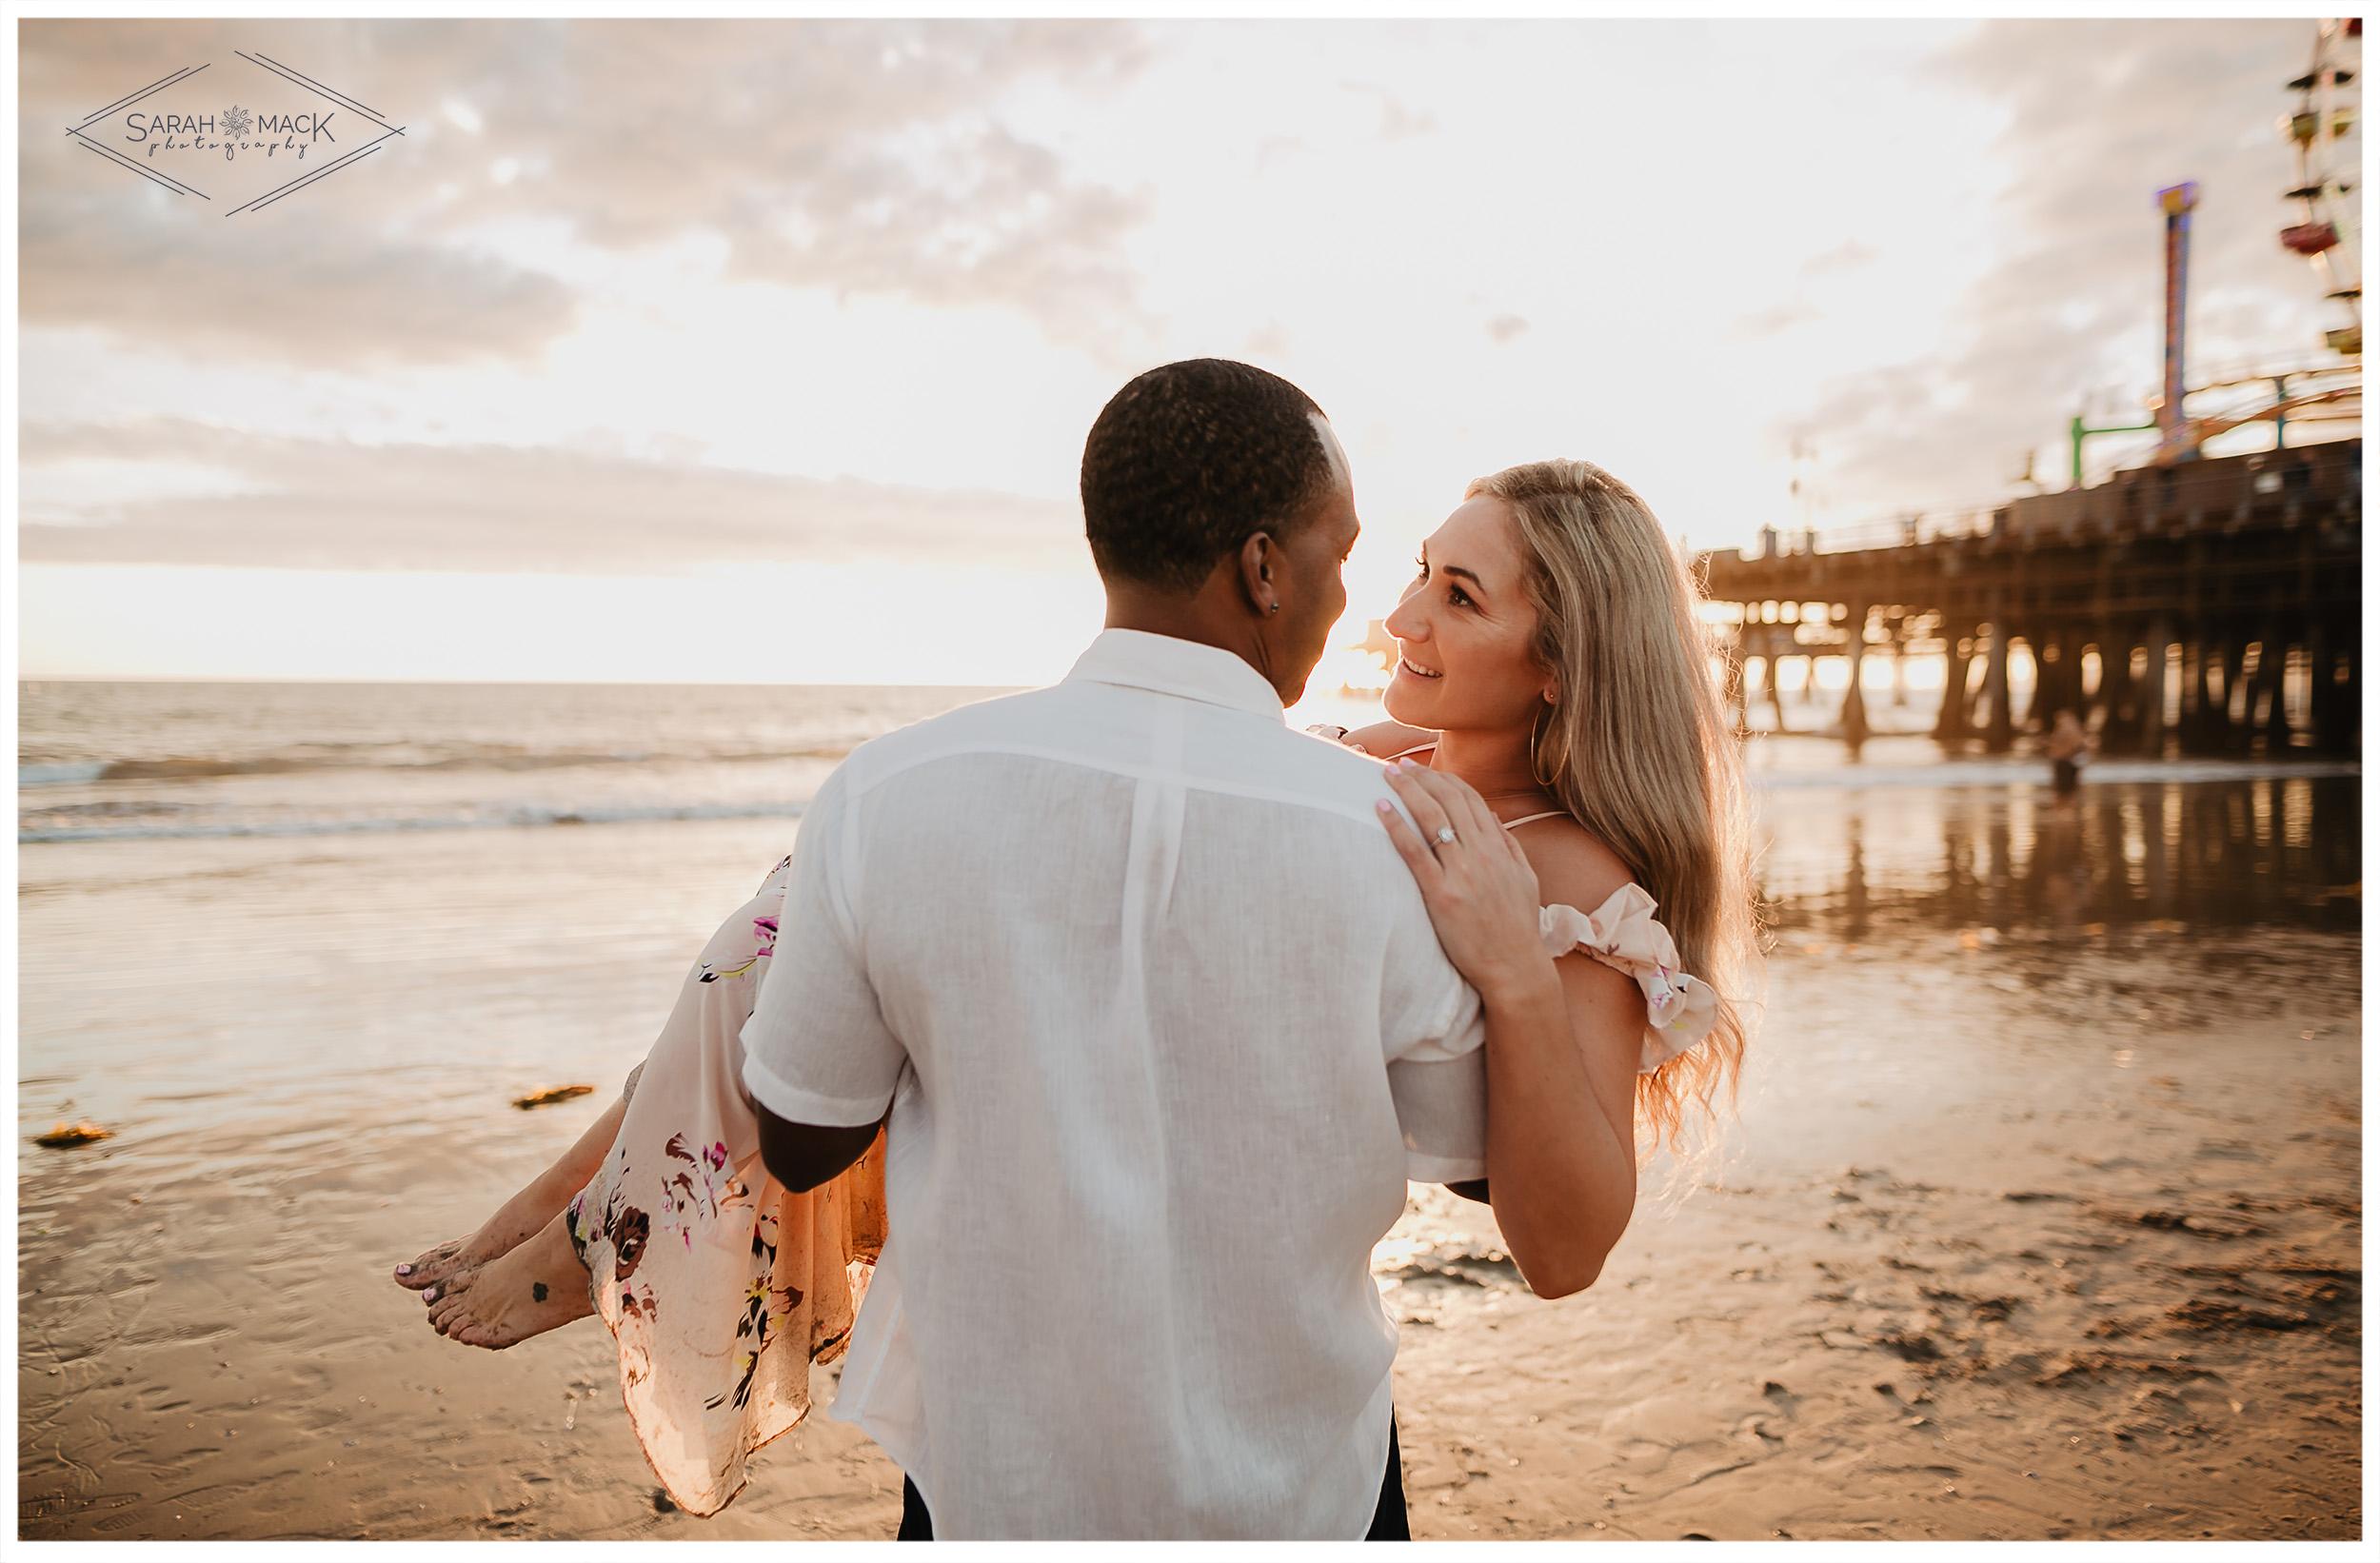 MK-Santa-Monica-Pier-Engagement-Photography-23.jpg